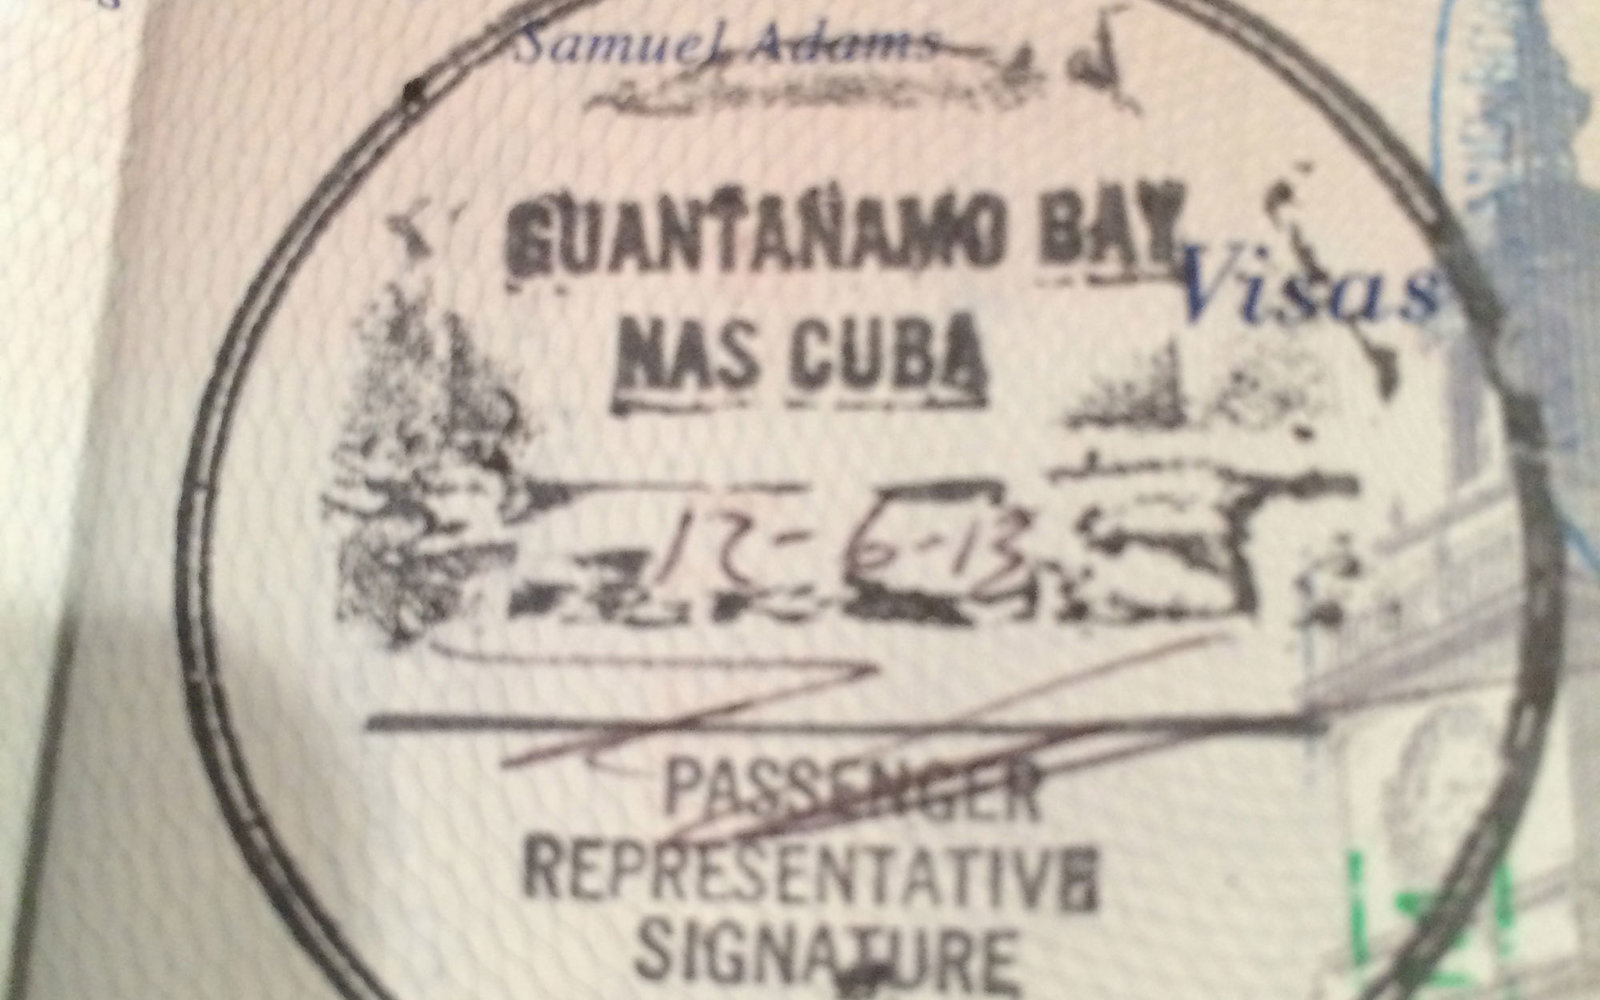 Baie de Guantanamo, Cuba